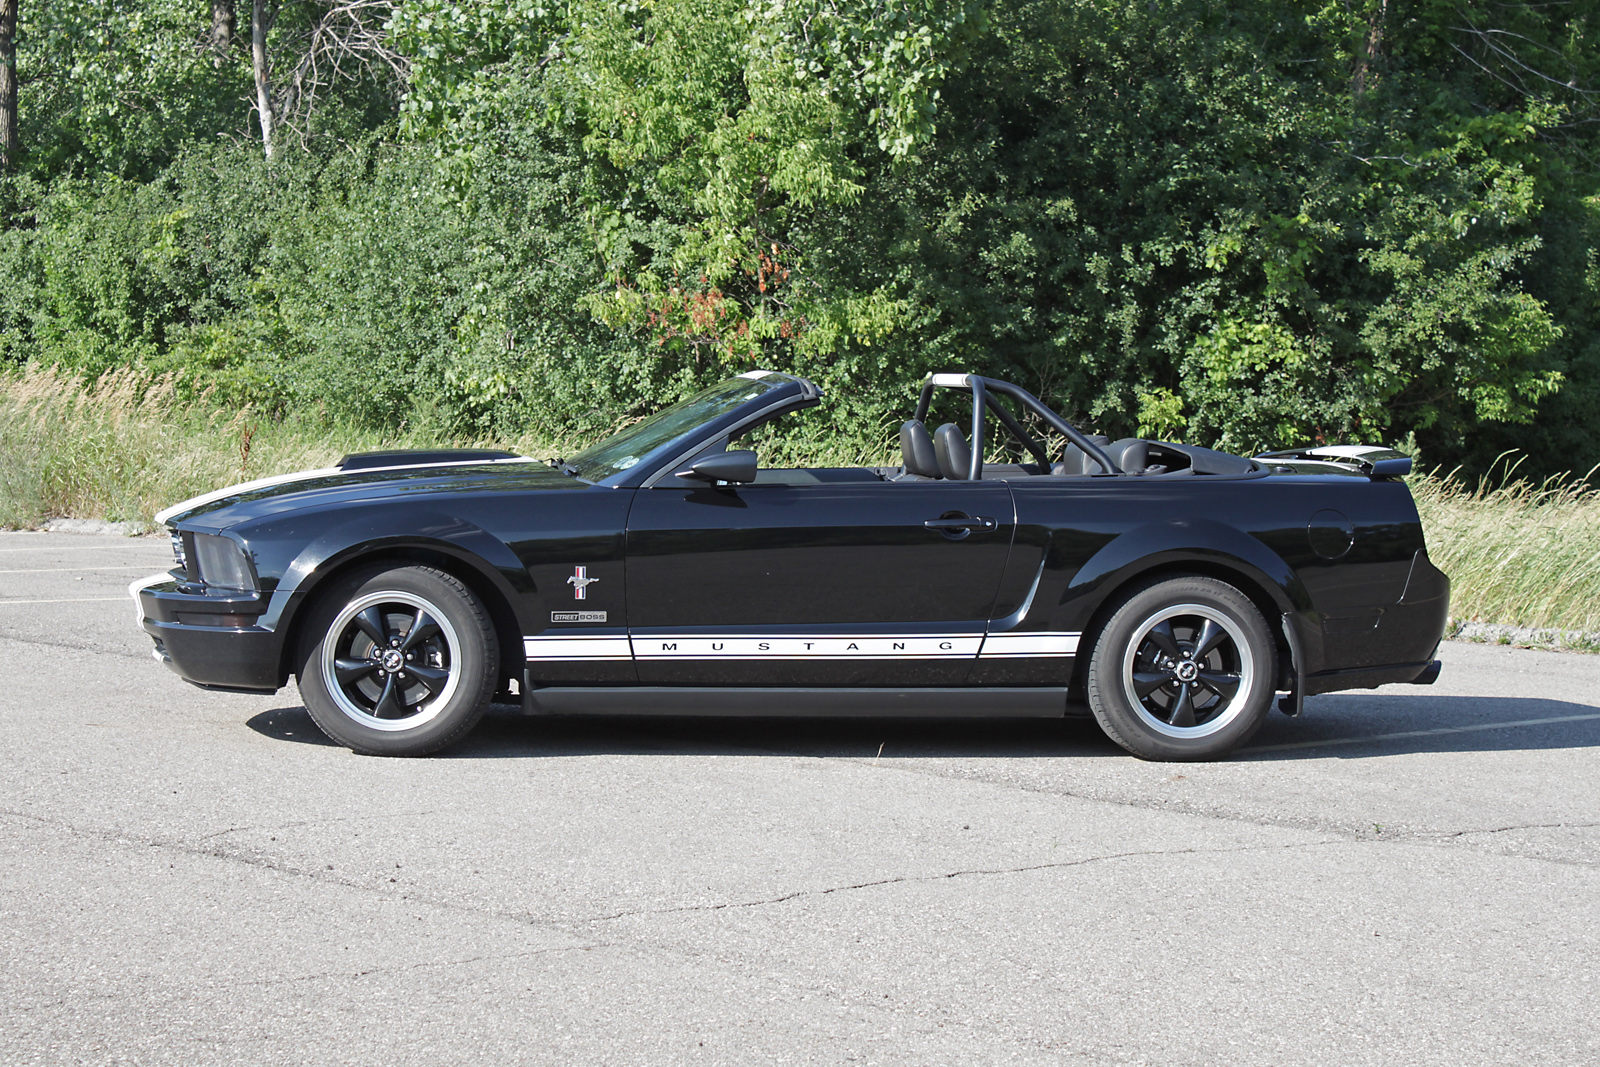 Click image for larger version  Name:Jim Carolan Mustang 5a.jpg Views:68 Size:1.19 MB ID:35810